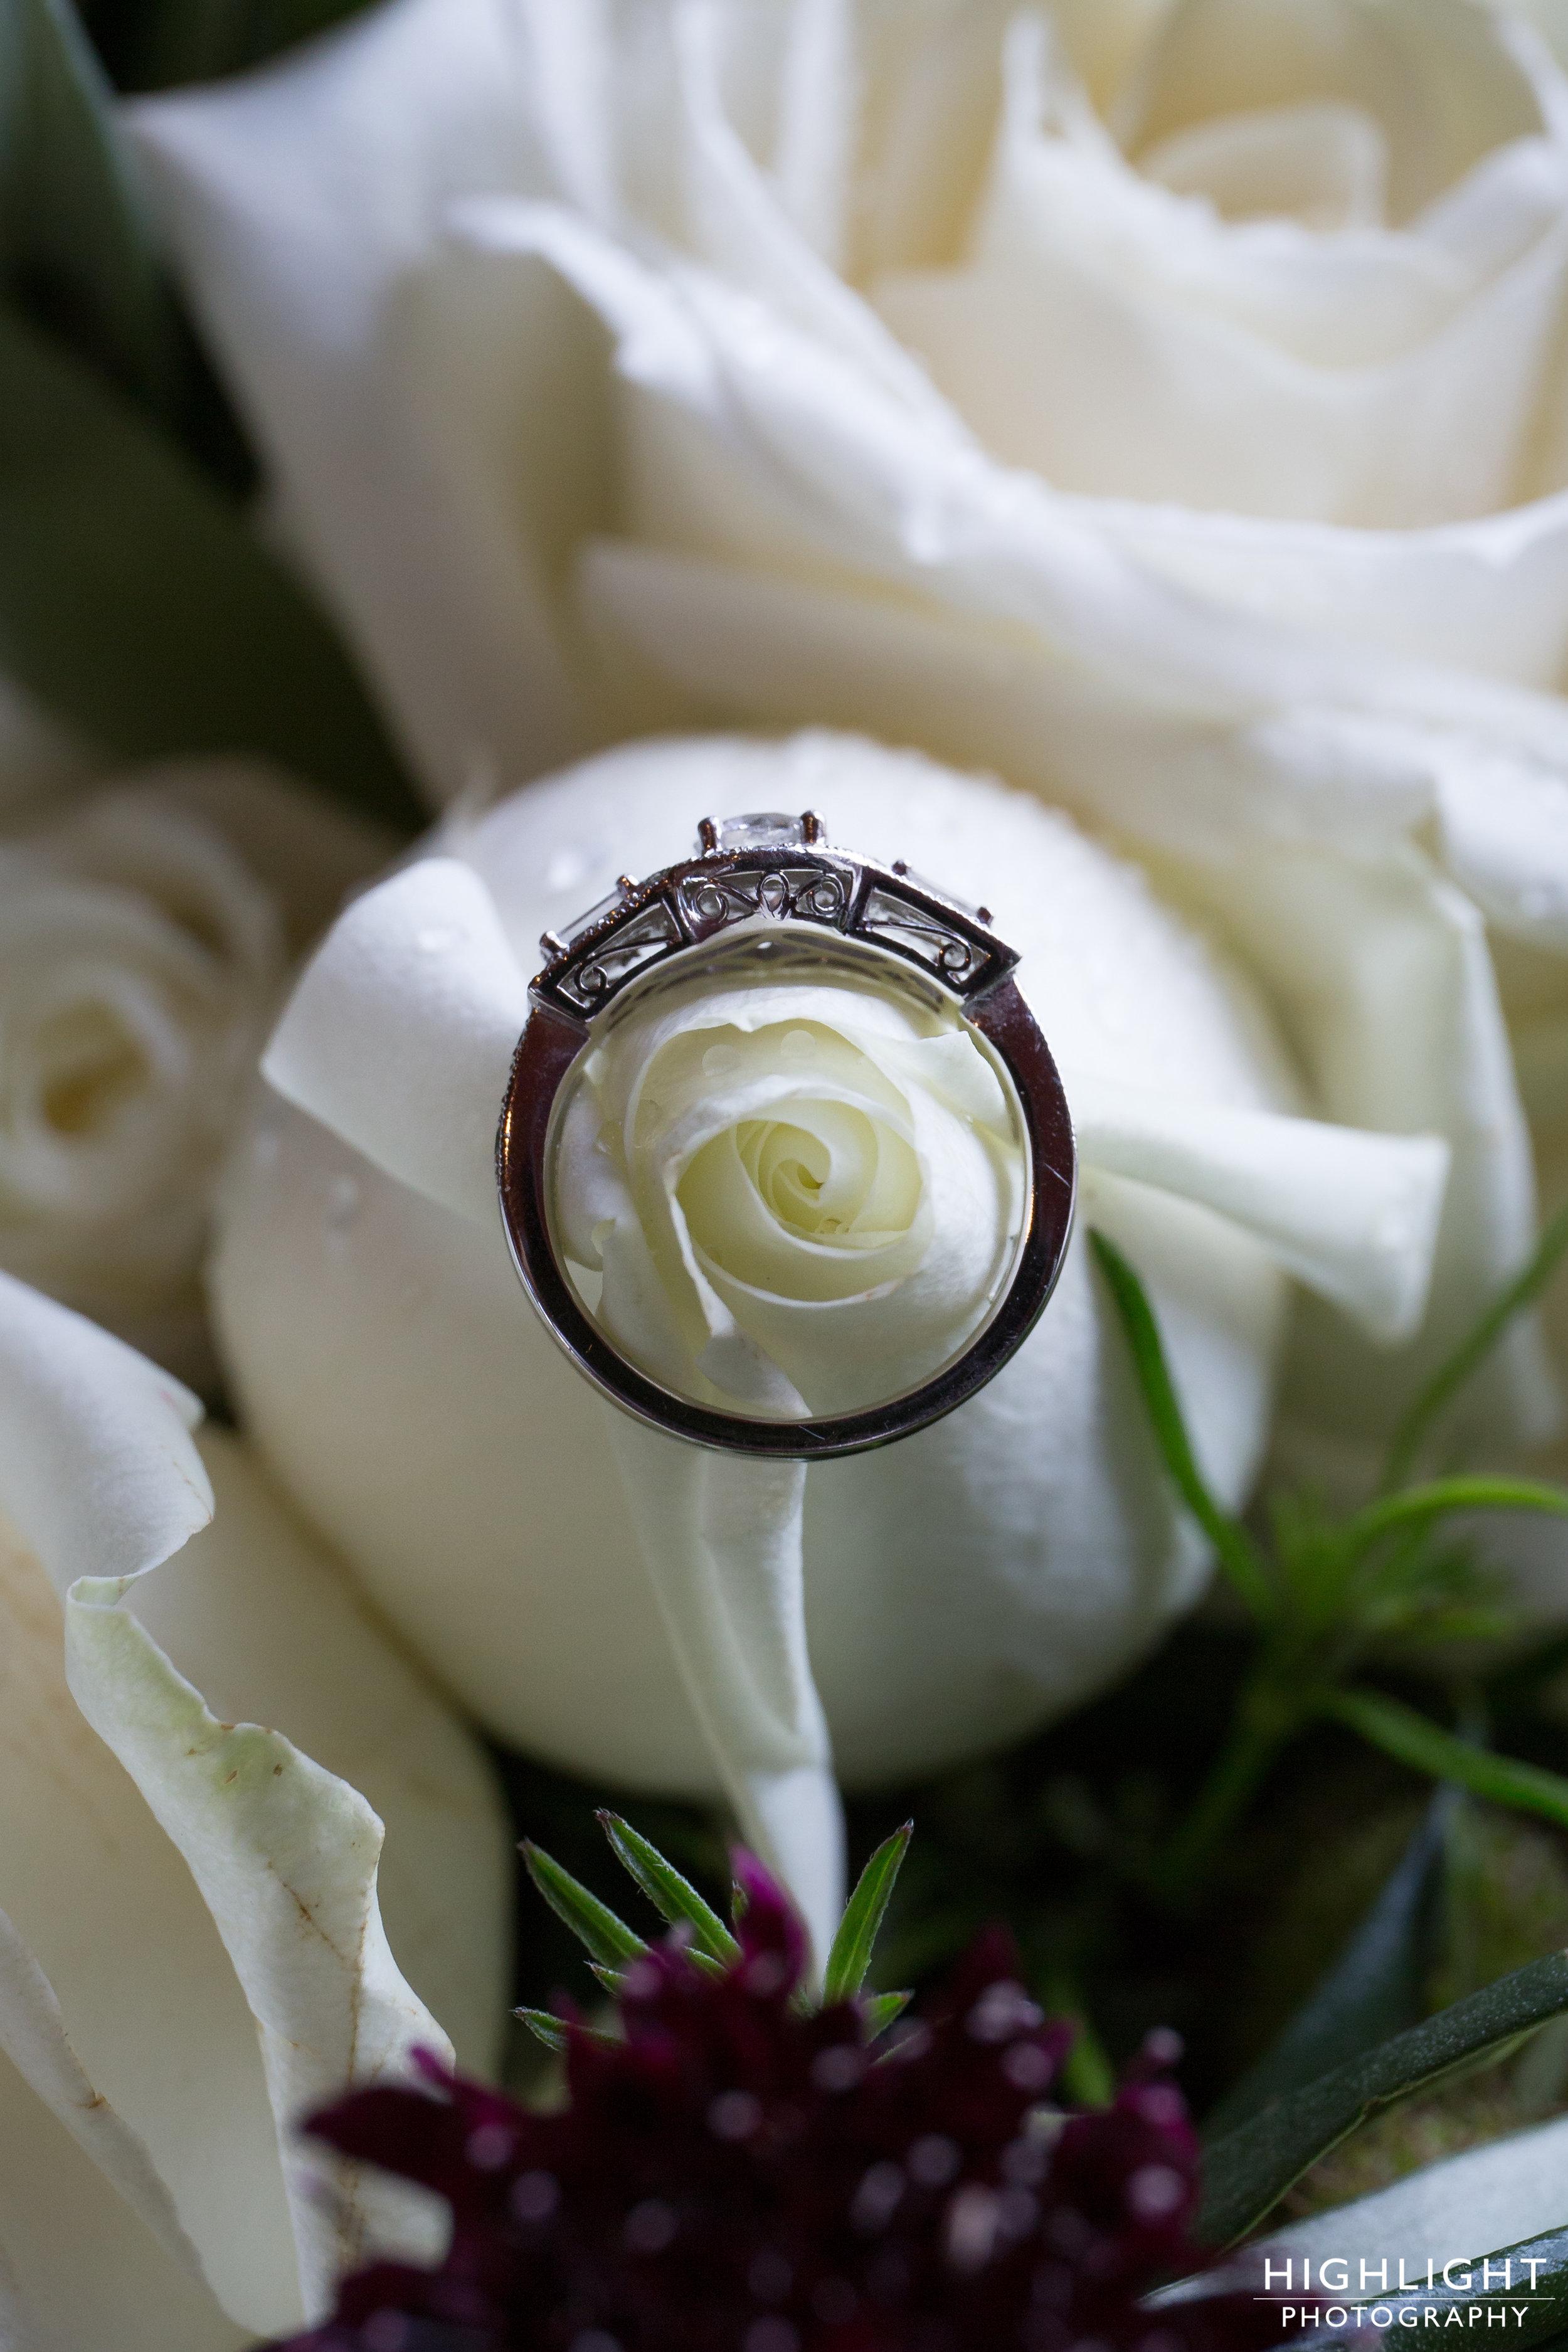 rose-johnny-highlight-wedding-photography-palmerston-north-manawatu